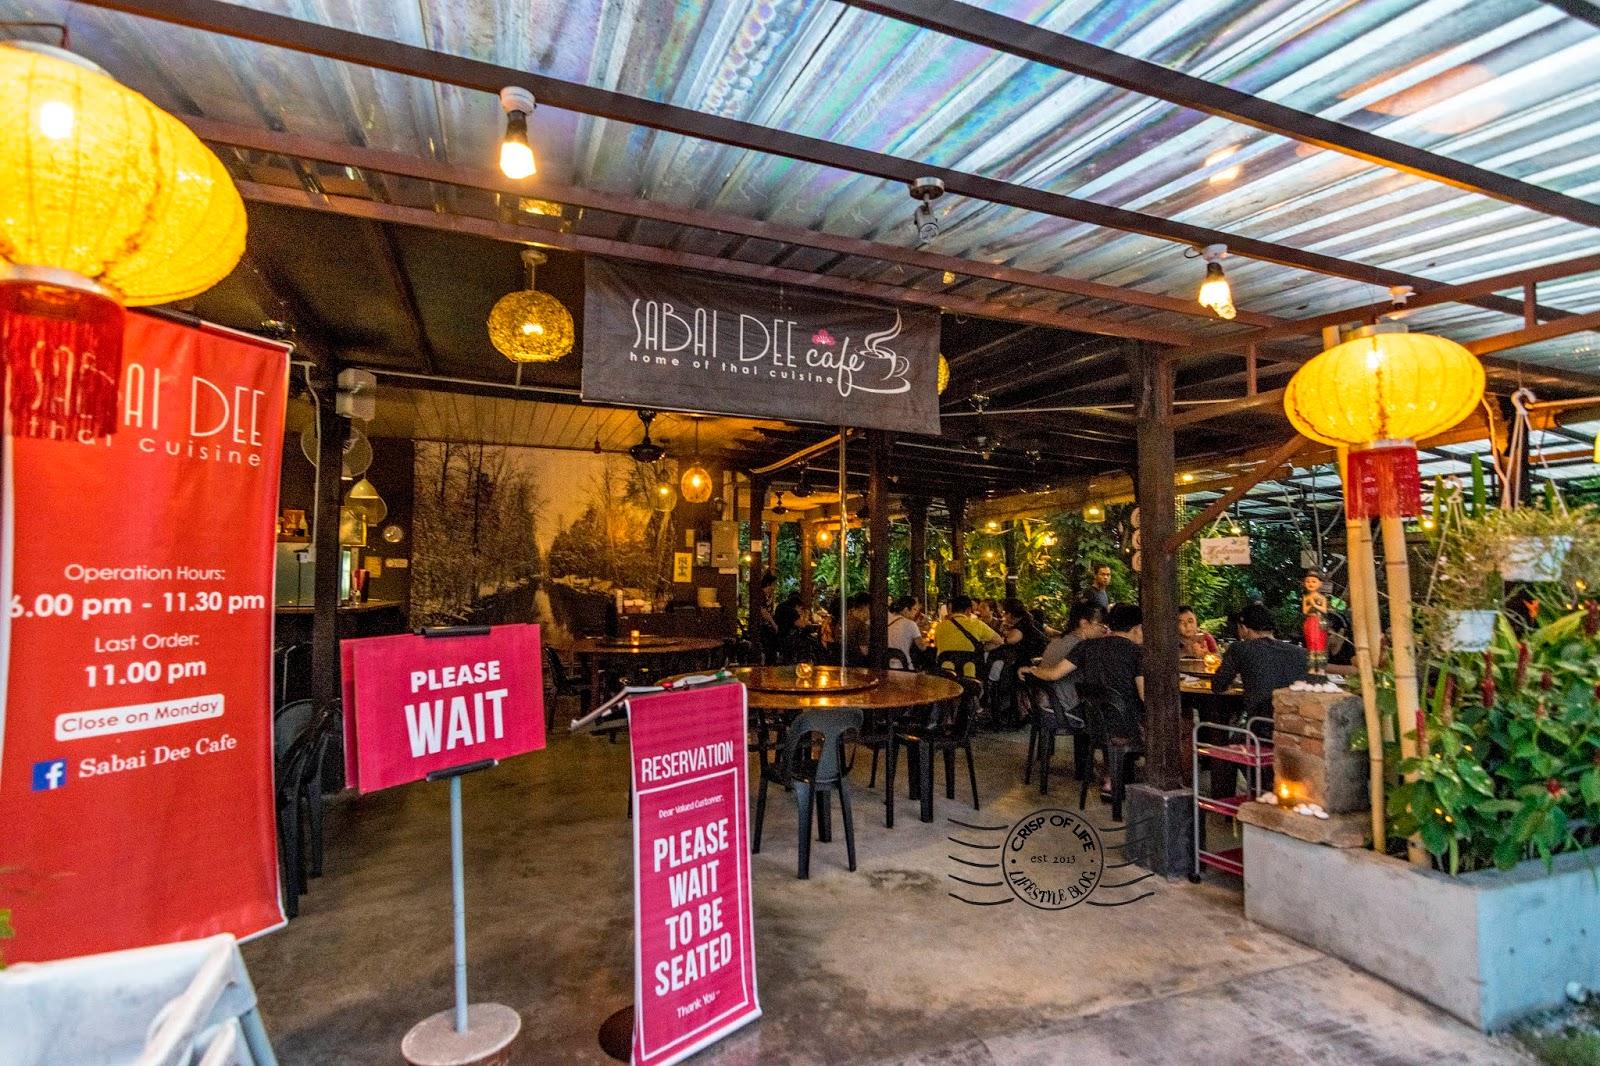 A Garden Thai Restaurant @ Sabai Dee Cafe, Jitra, Kedah